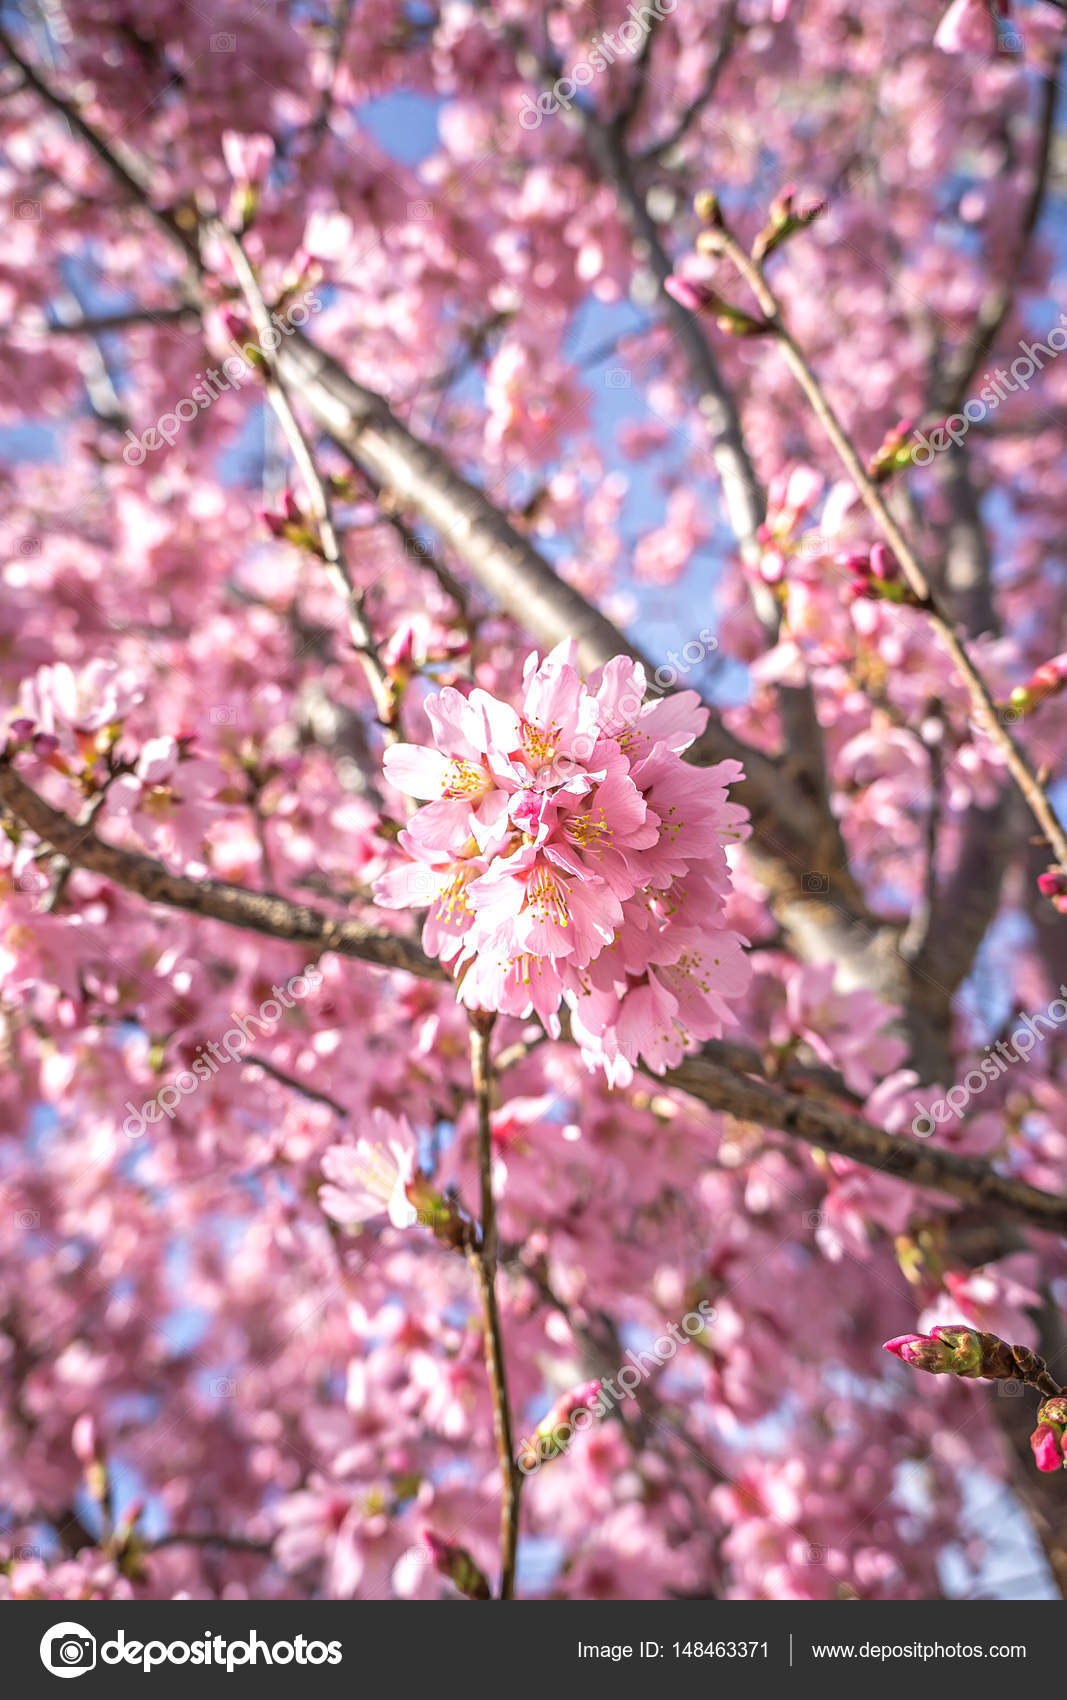 Spring bloom tree with pink flowers stock photo digidream 148463371 spring bloom tree with pink flowers stock photo mightylinksfo